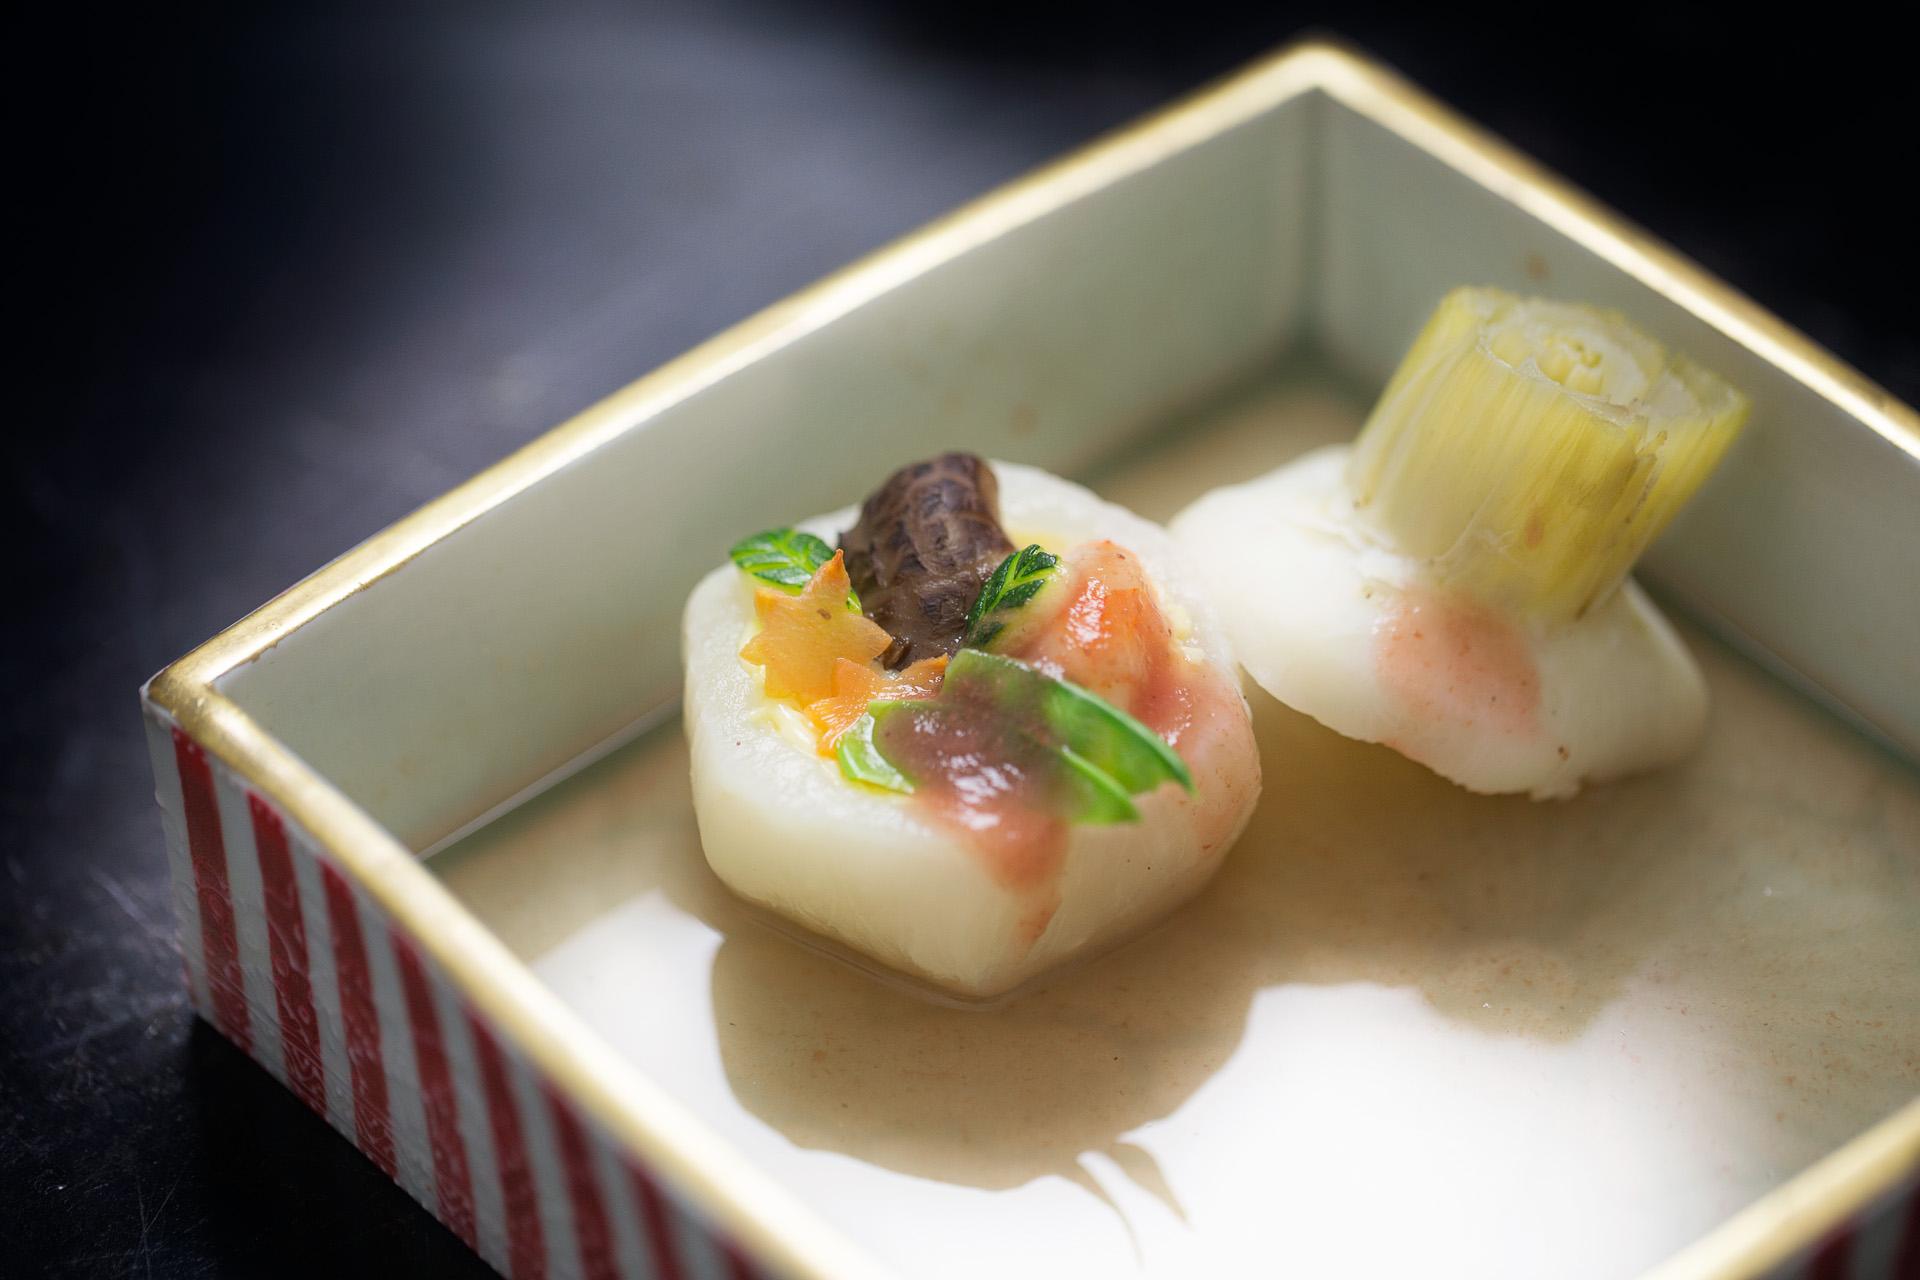 Kyoto Shokunin Kobo e lo chef Kazuhiko Endo nel ristorante Doozo